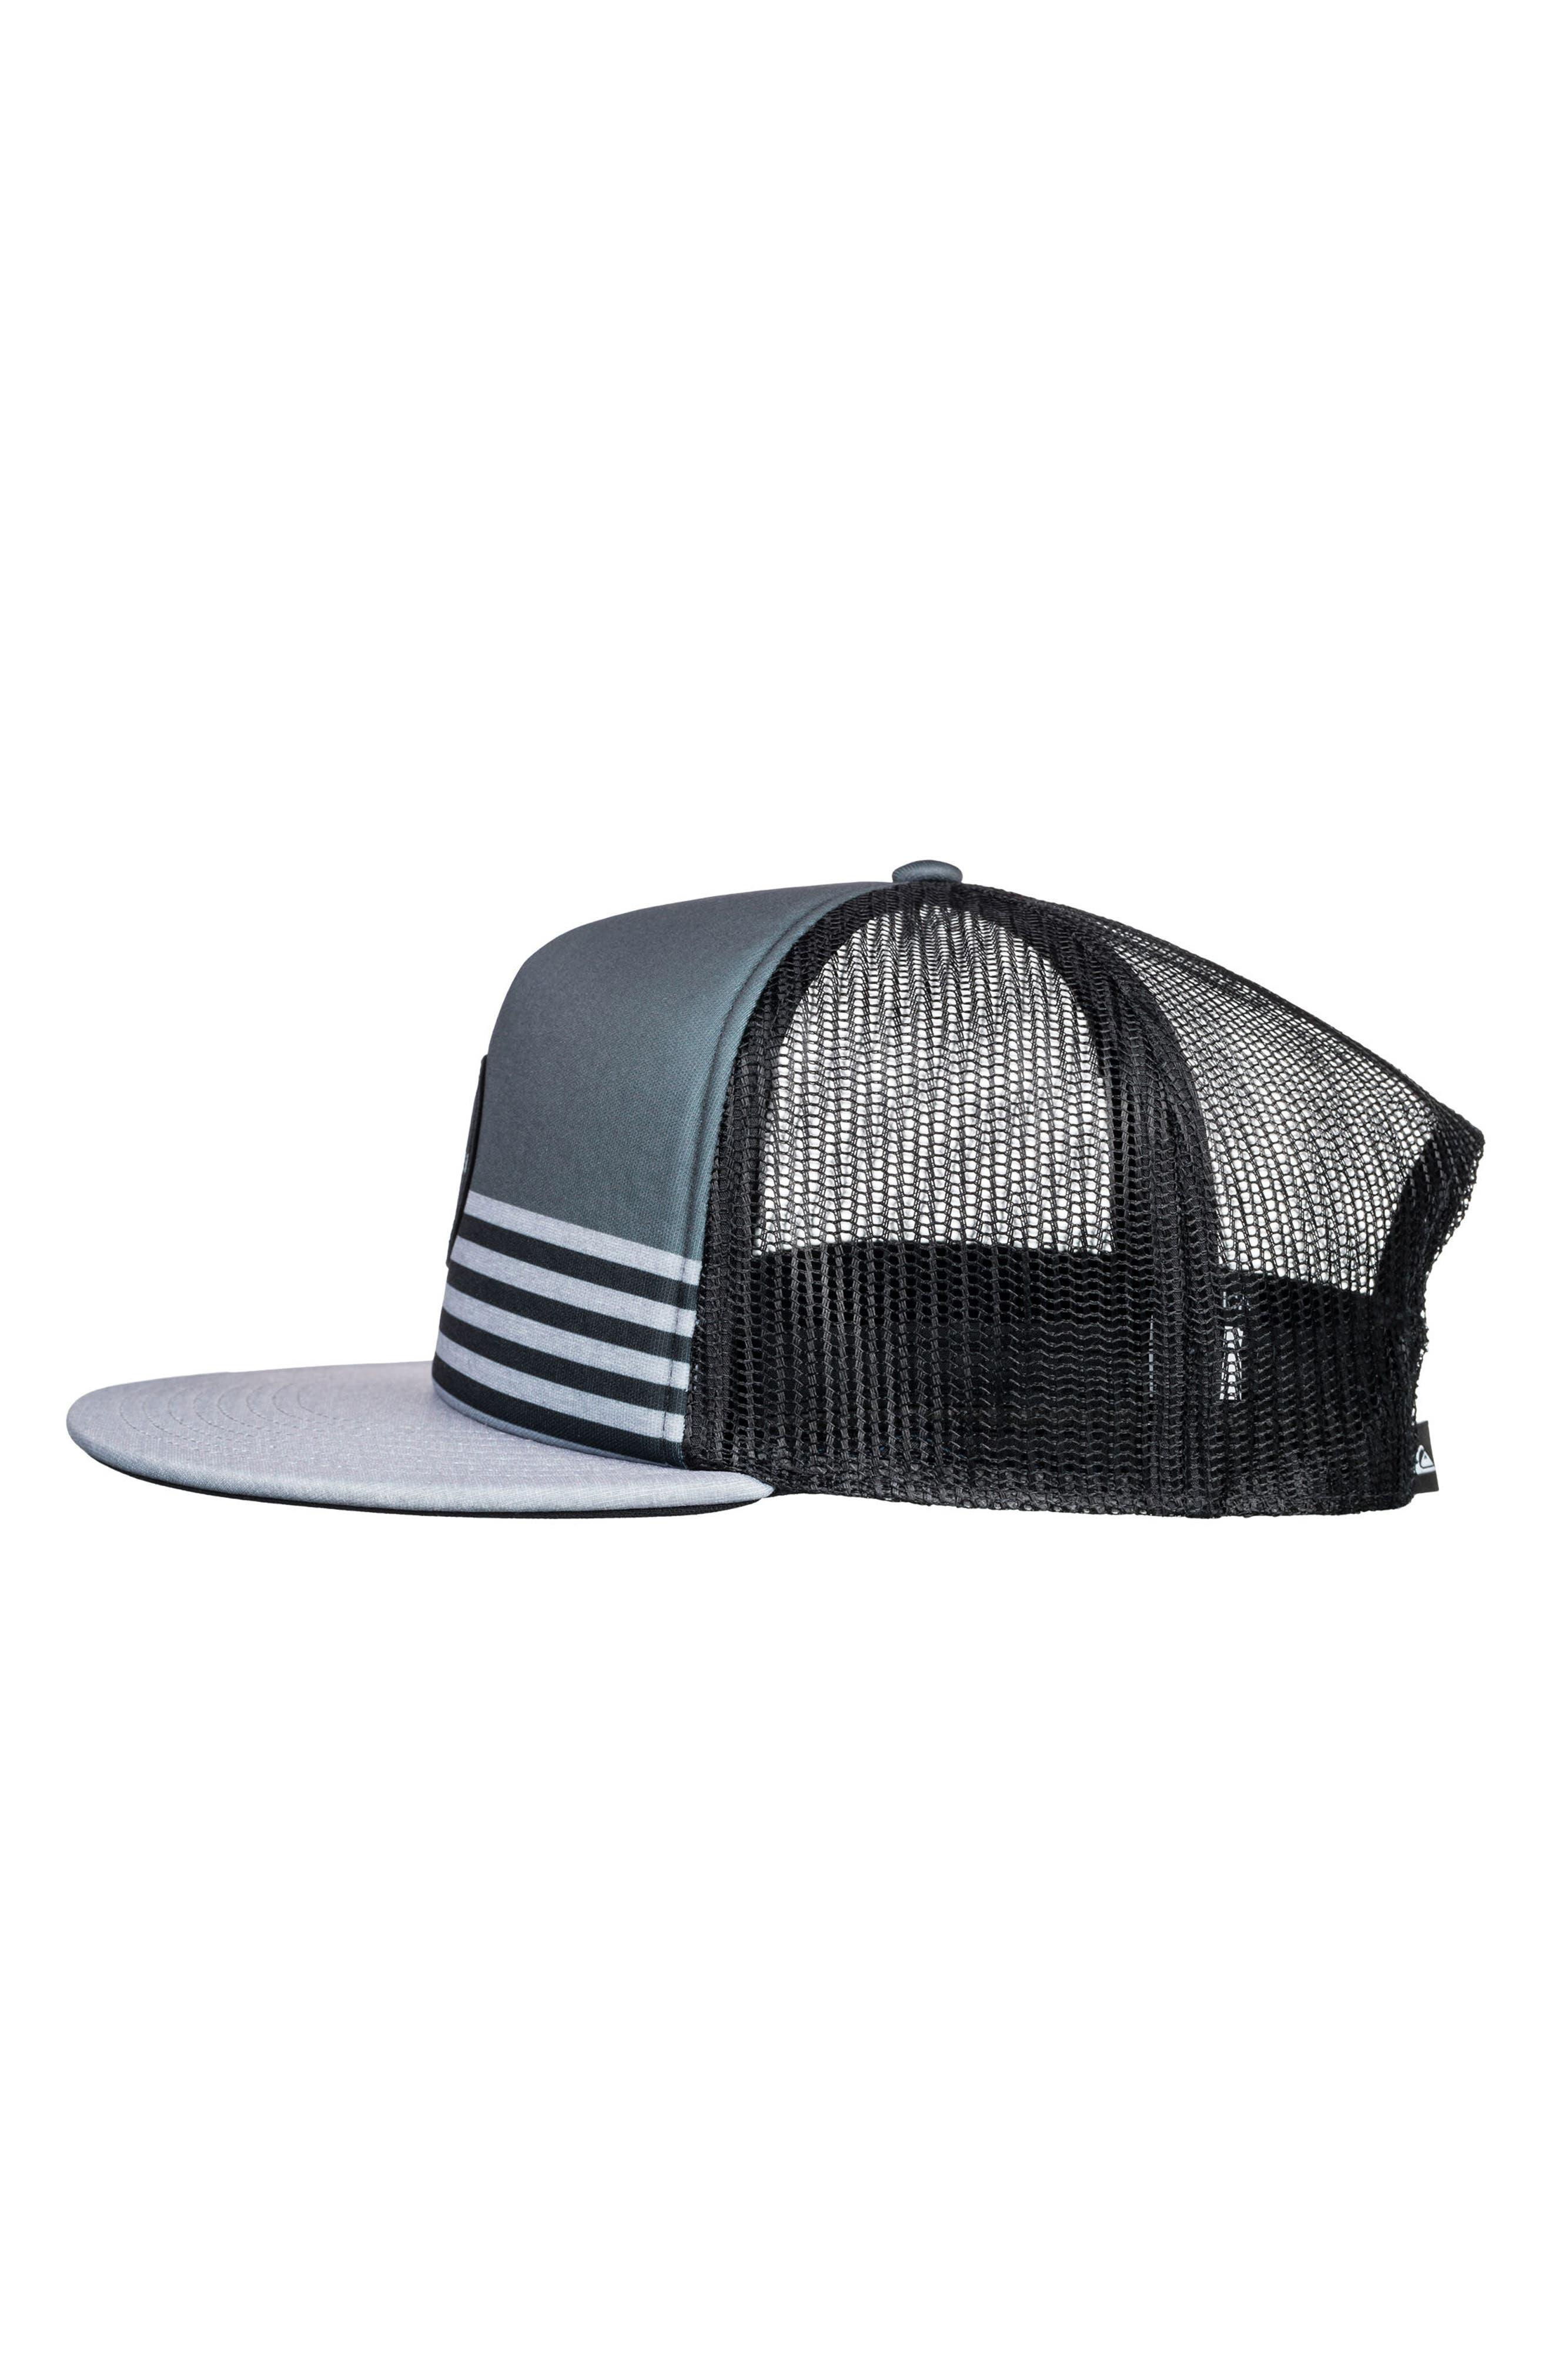 Vixten Trucker Hat,                             Alternate thumbnail 3, color,                             Iron Gate